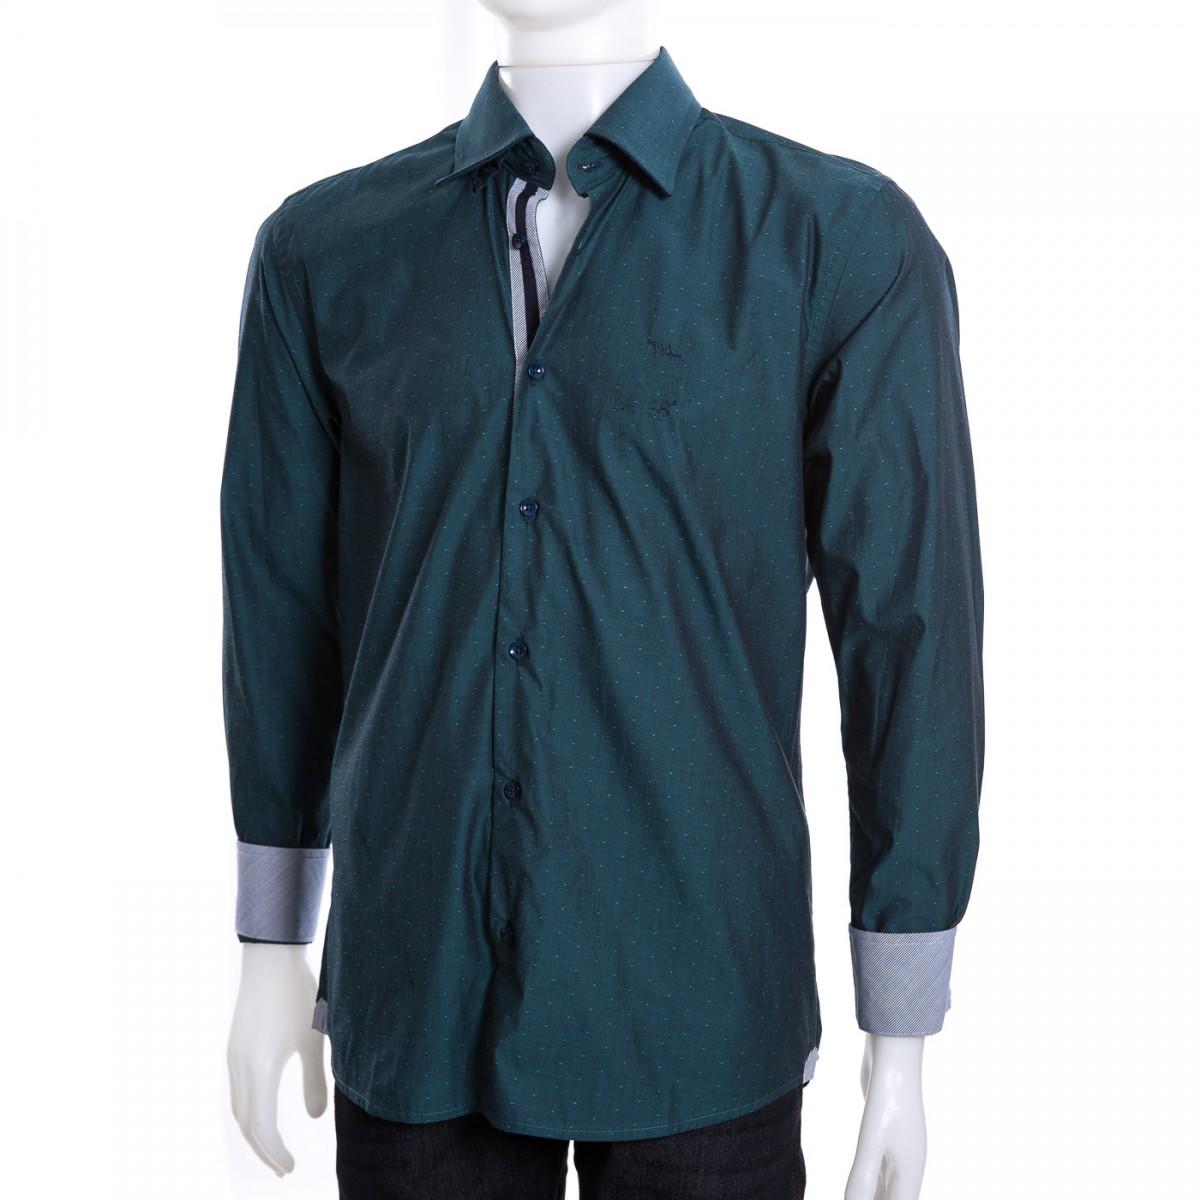 2d3c4a0b38 Bizz Store - Camisa Social Masculina W.Albann Slim Fio 60